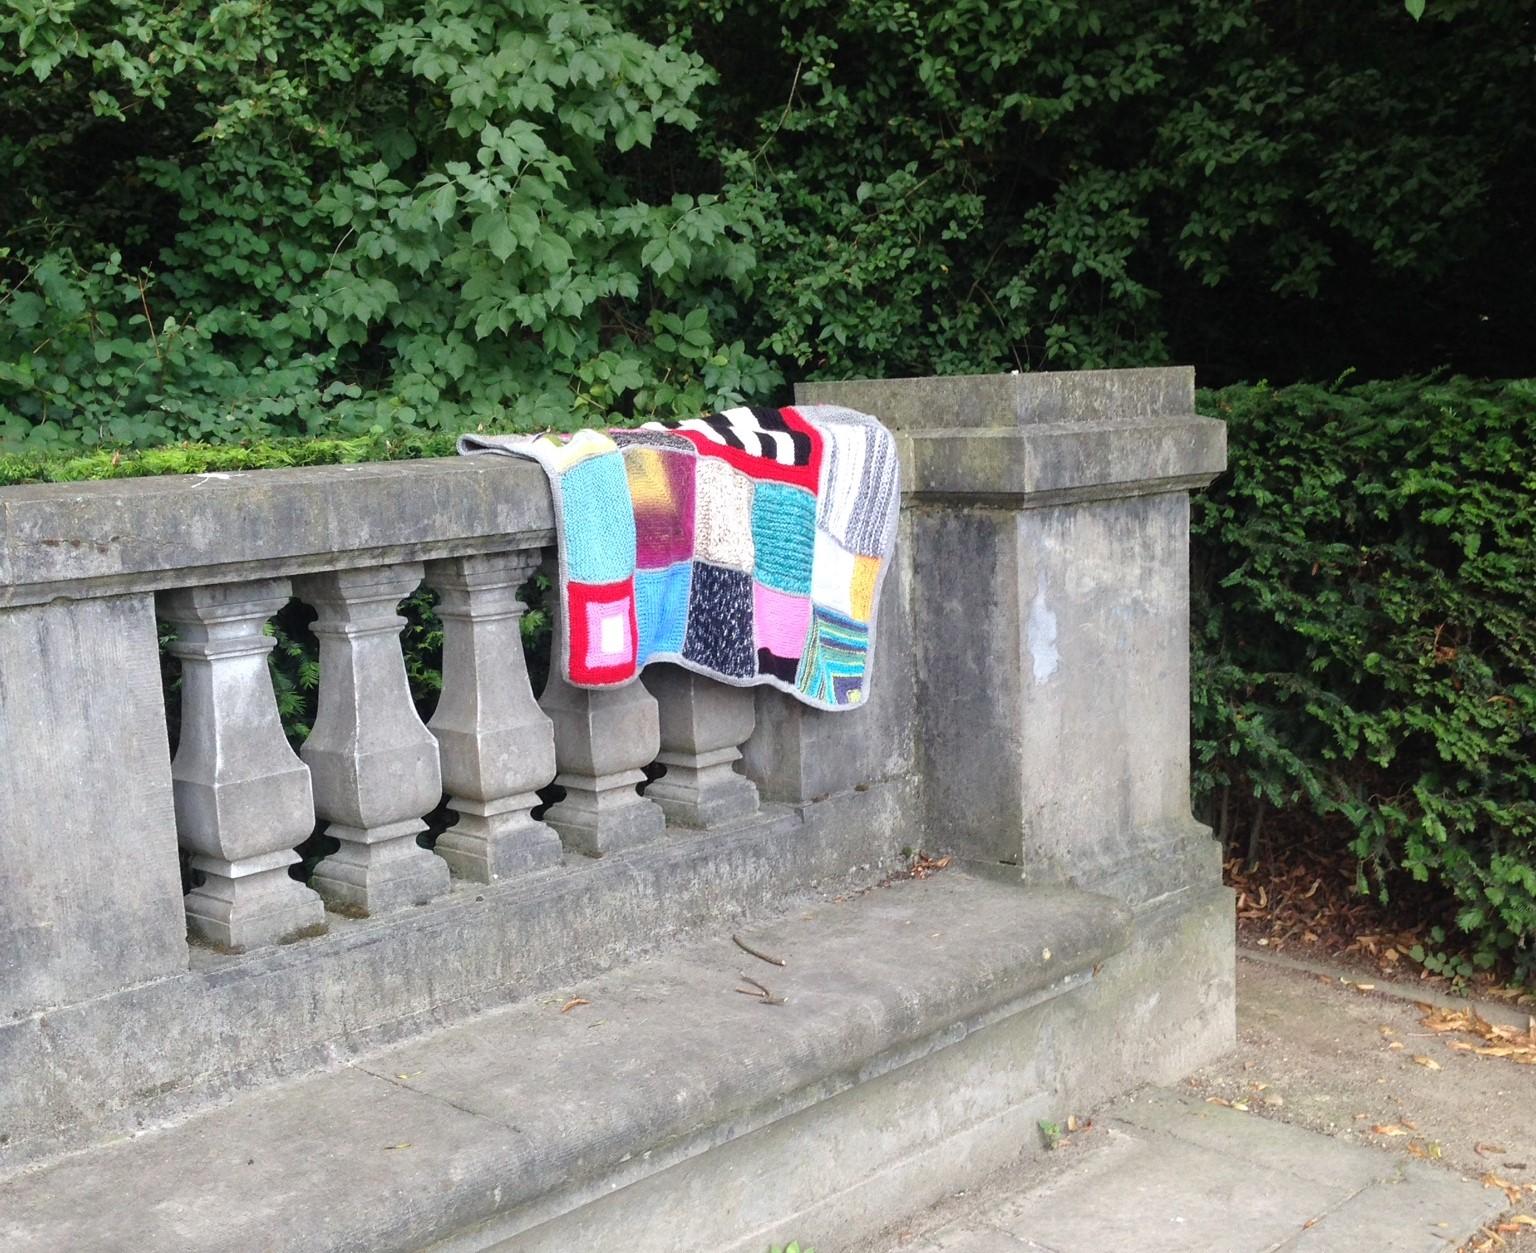 WWKIP blanket on wall 4.JPG